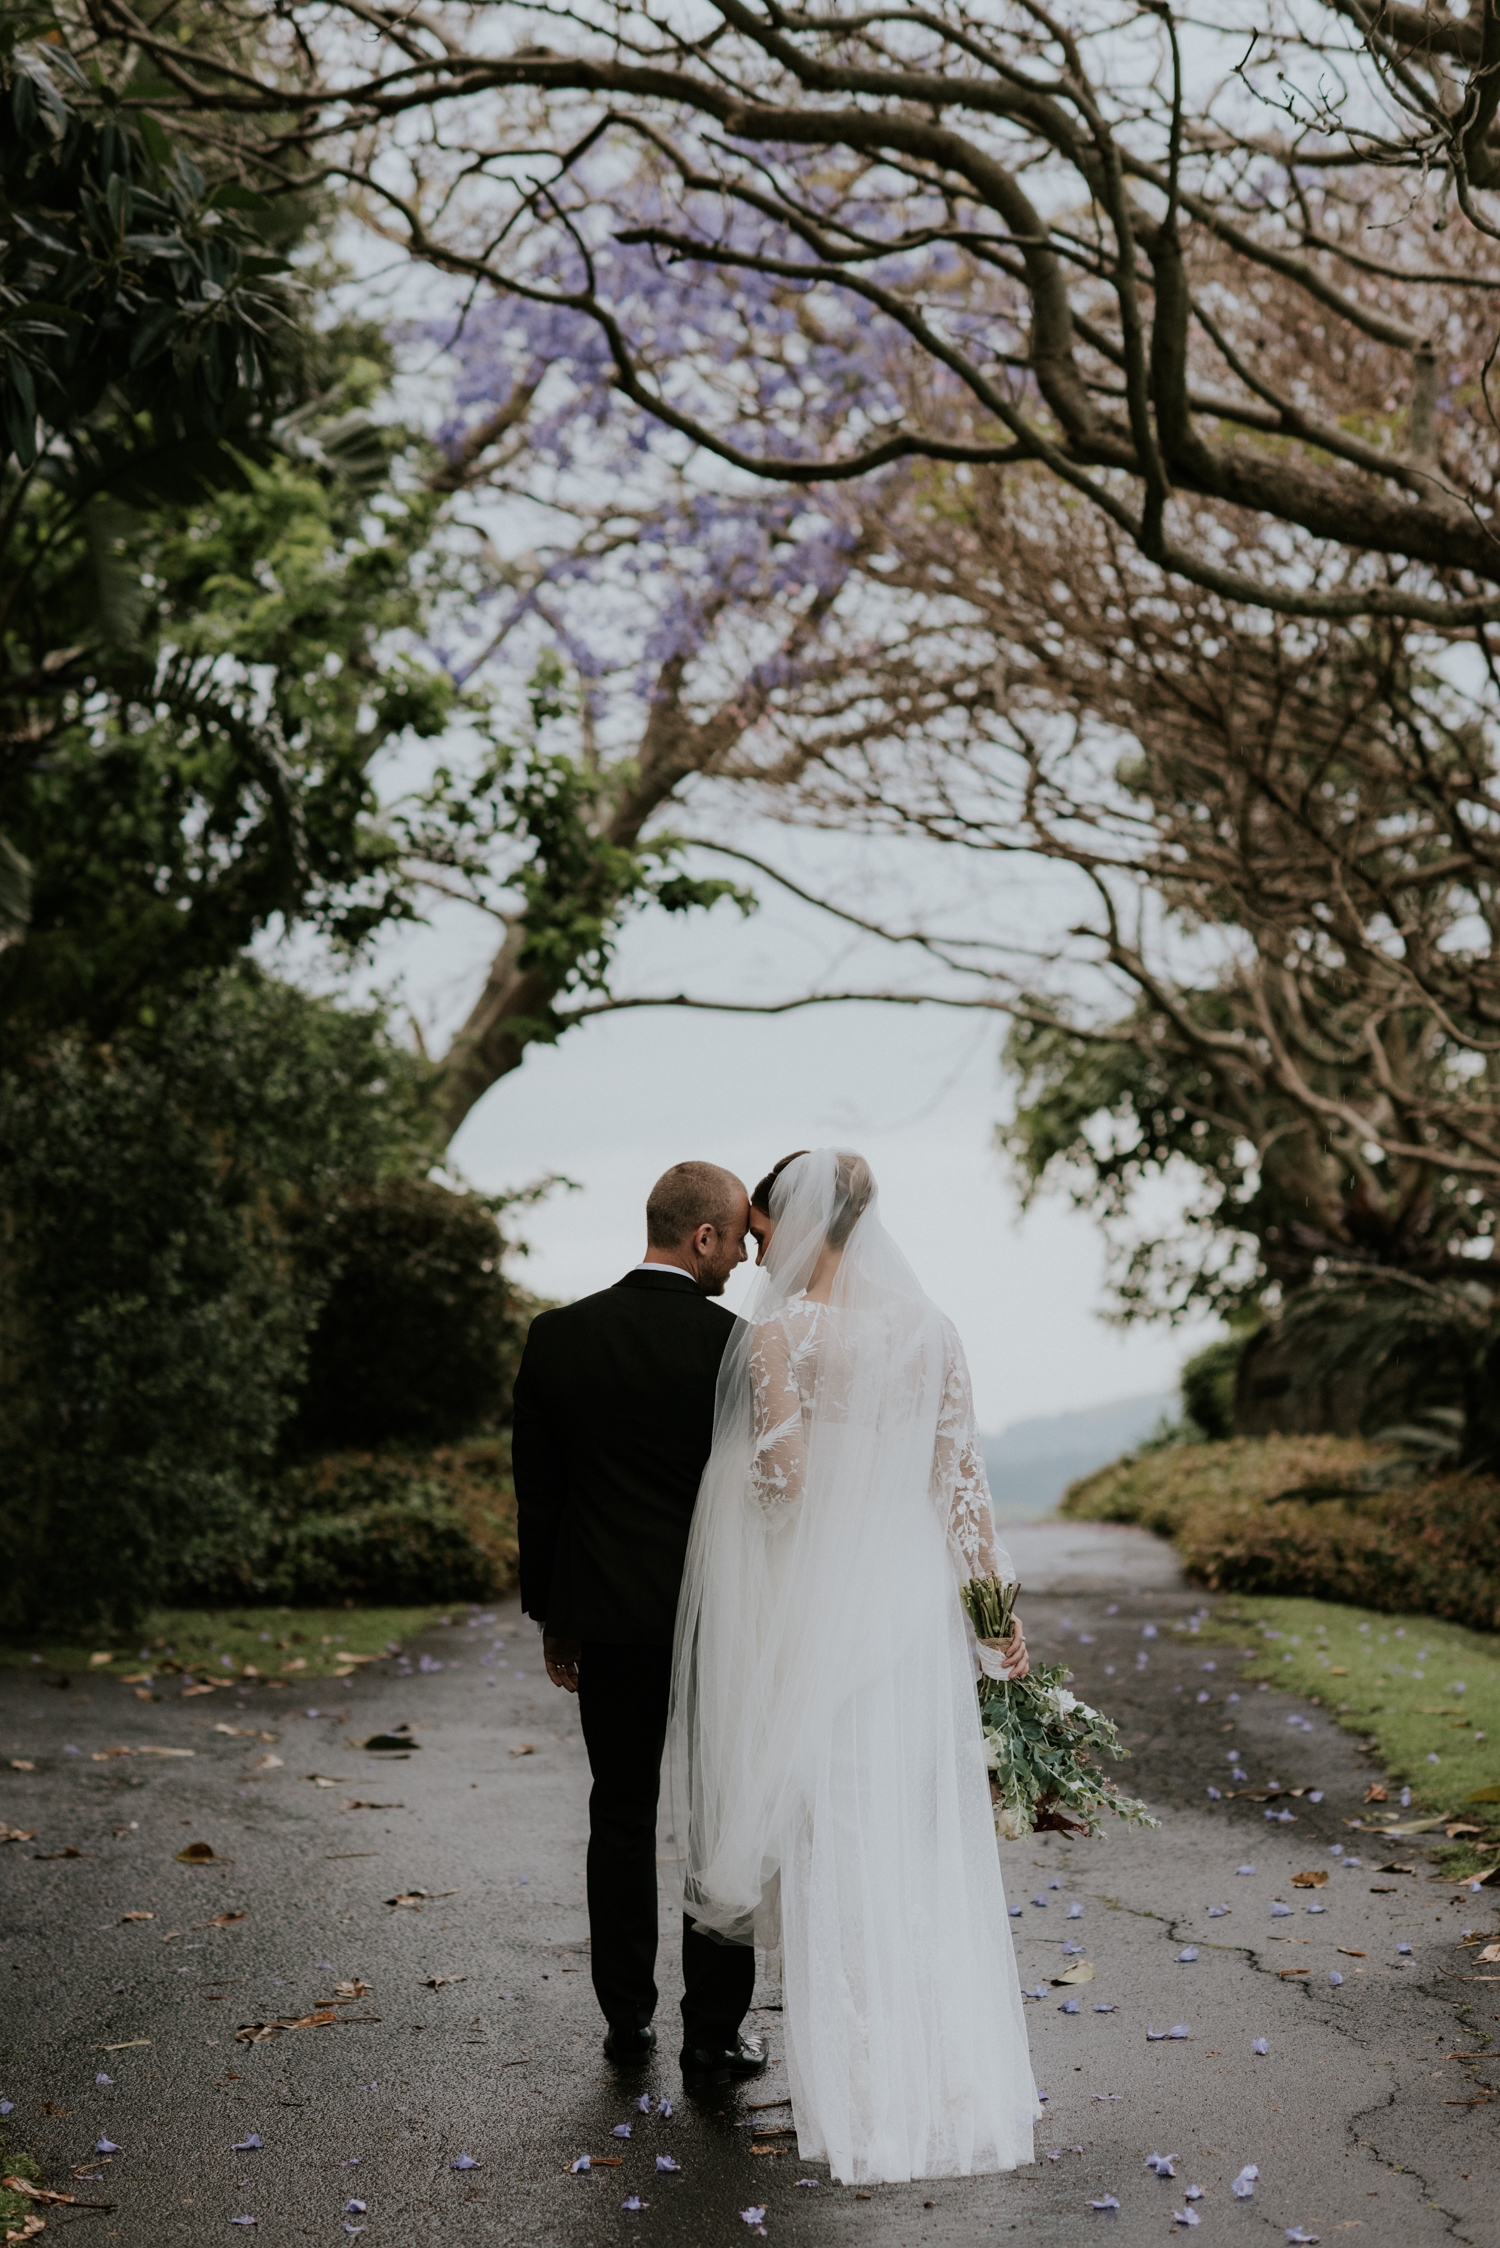 Brisbane Wedding Photographer   Engagement-Elopement Photography-83.jpg